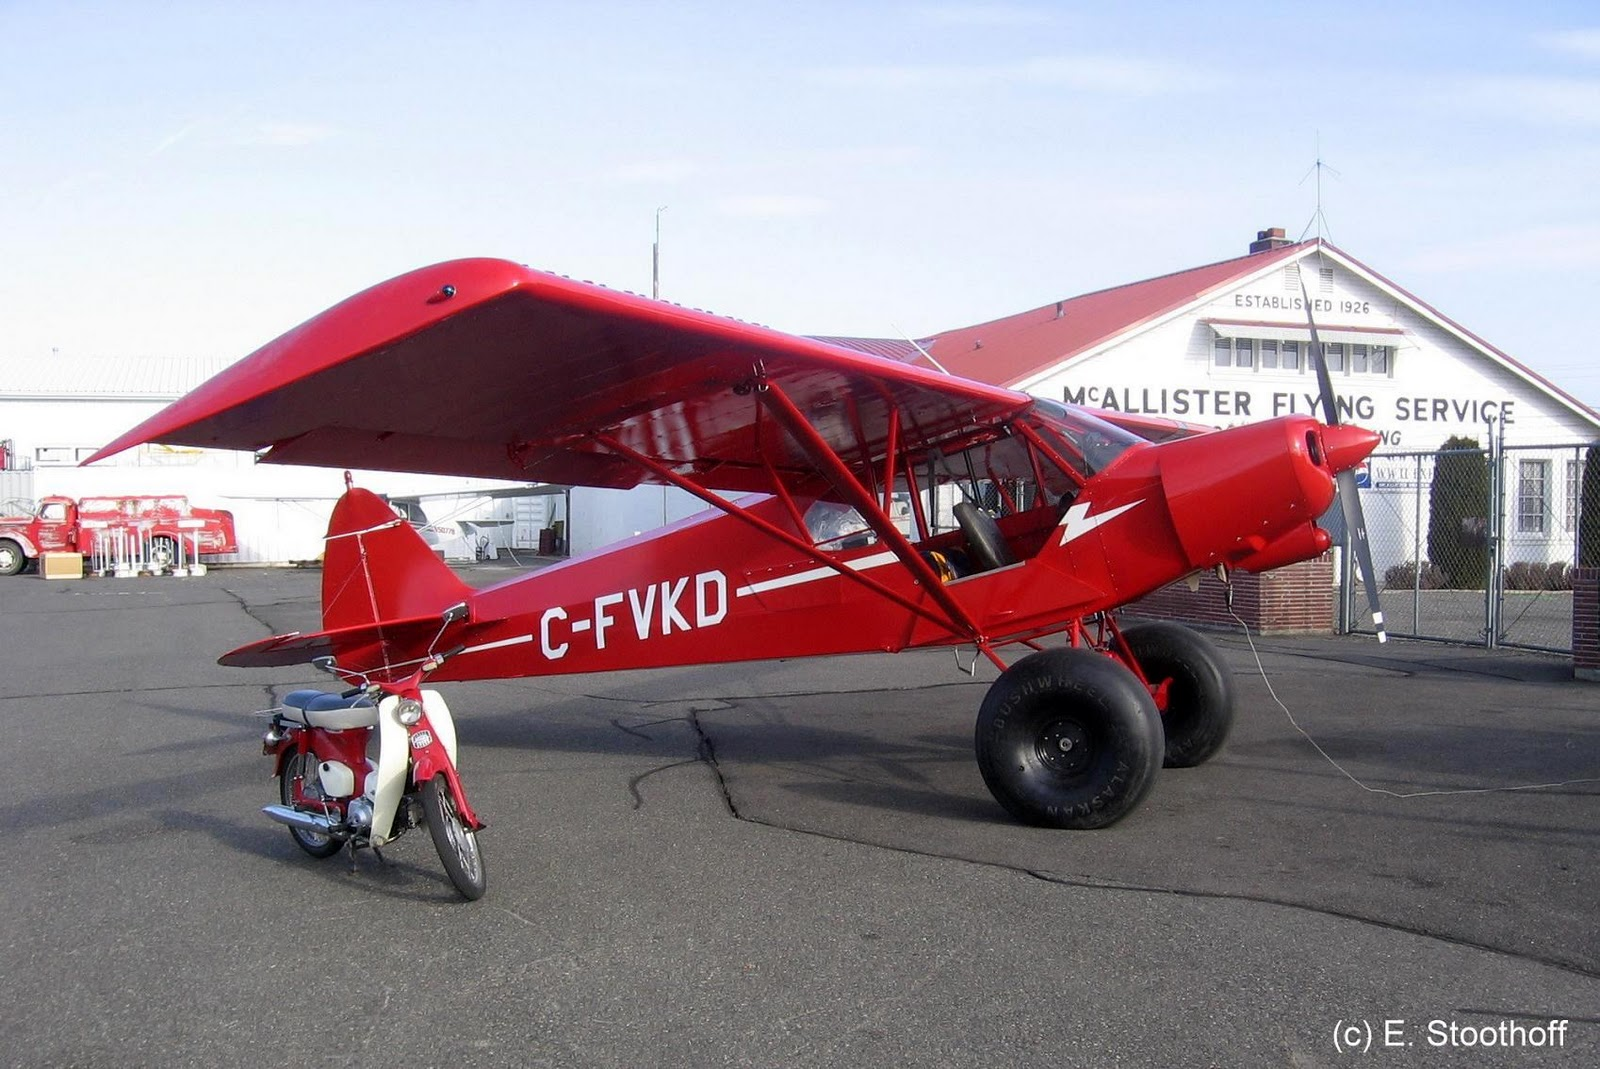 motorized airplanes with Super Cub on Cybird3CHRobotFlyingBirdElectricRCAirplane likewise  further Frank aviation video moreover Details in addition FMS800mmF4UCorsairV2MiniWarbirdsV24CH24GHzRTFRCAirplane.